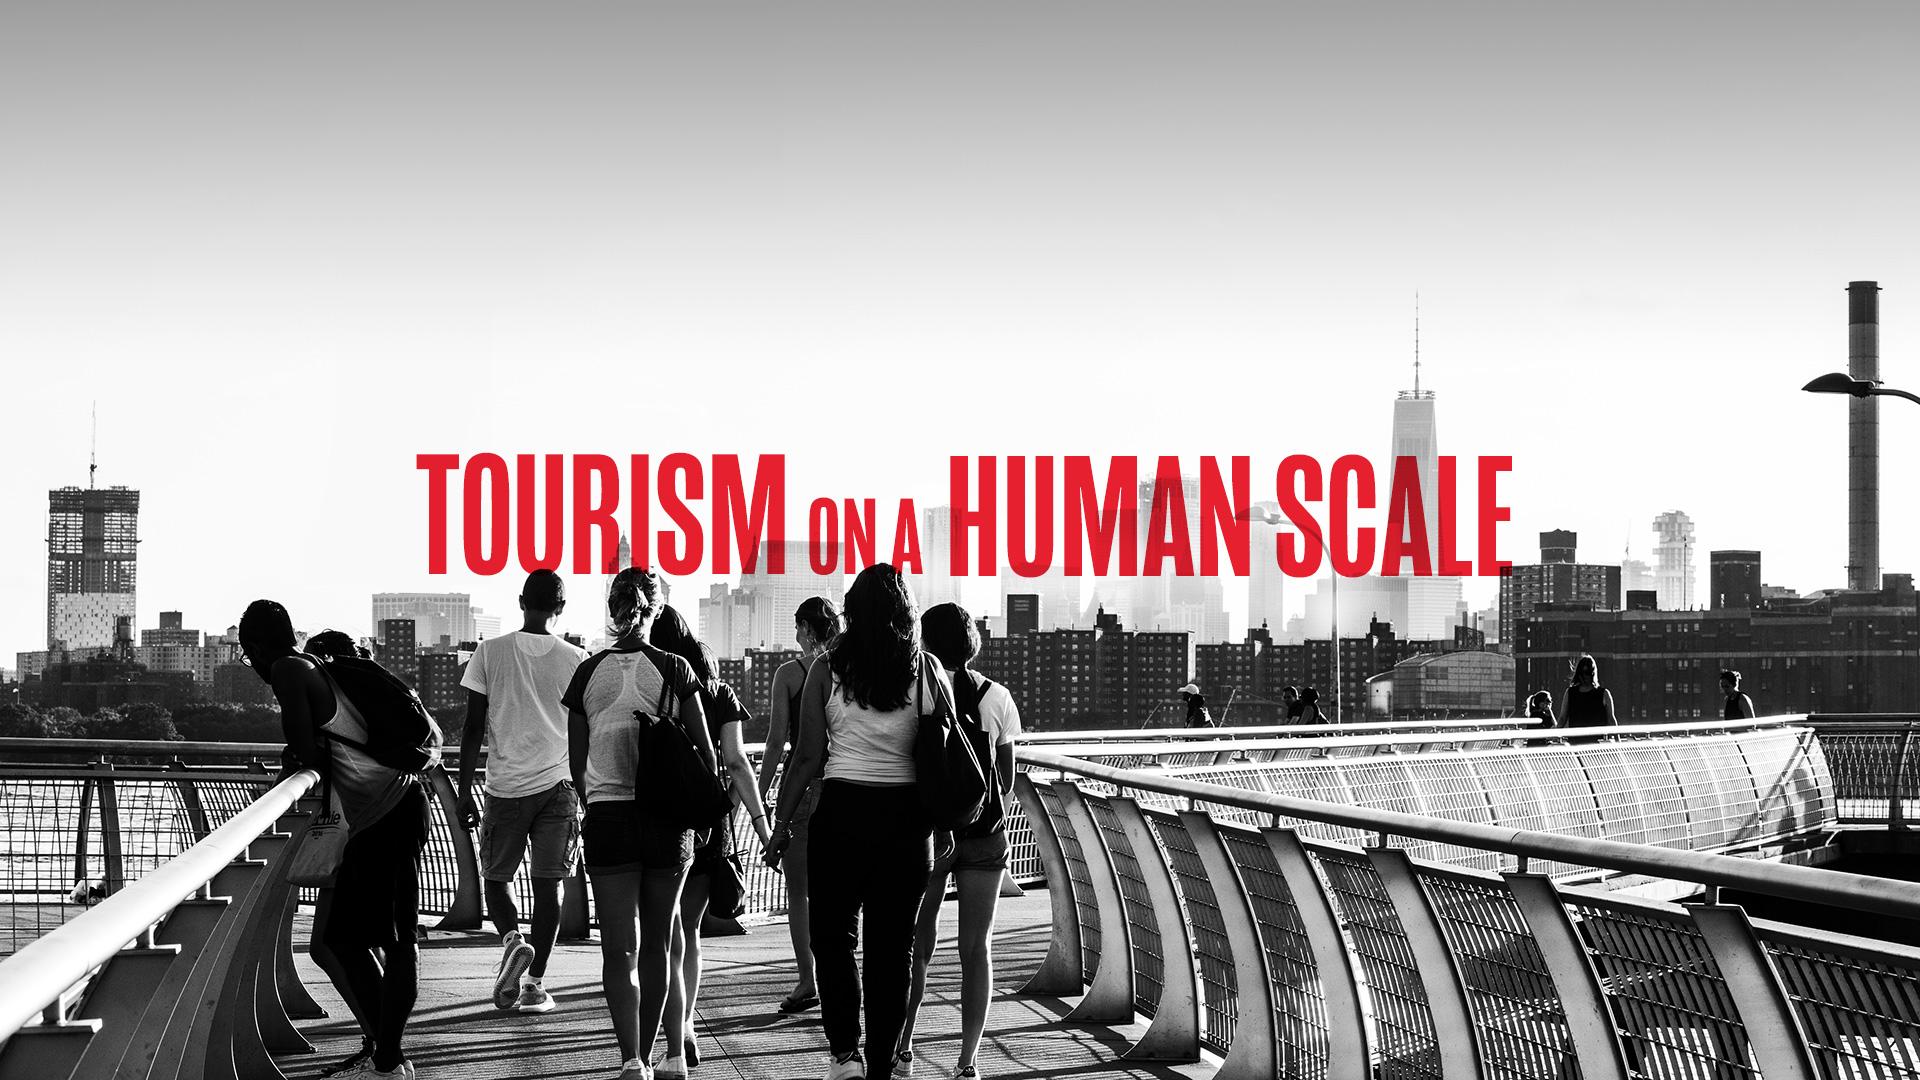 Tourism on a Human Scale